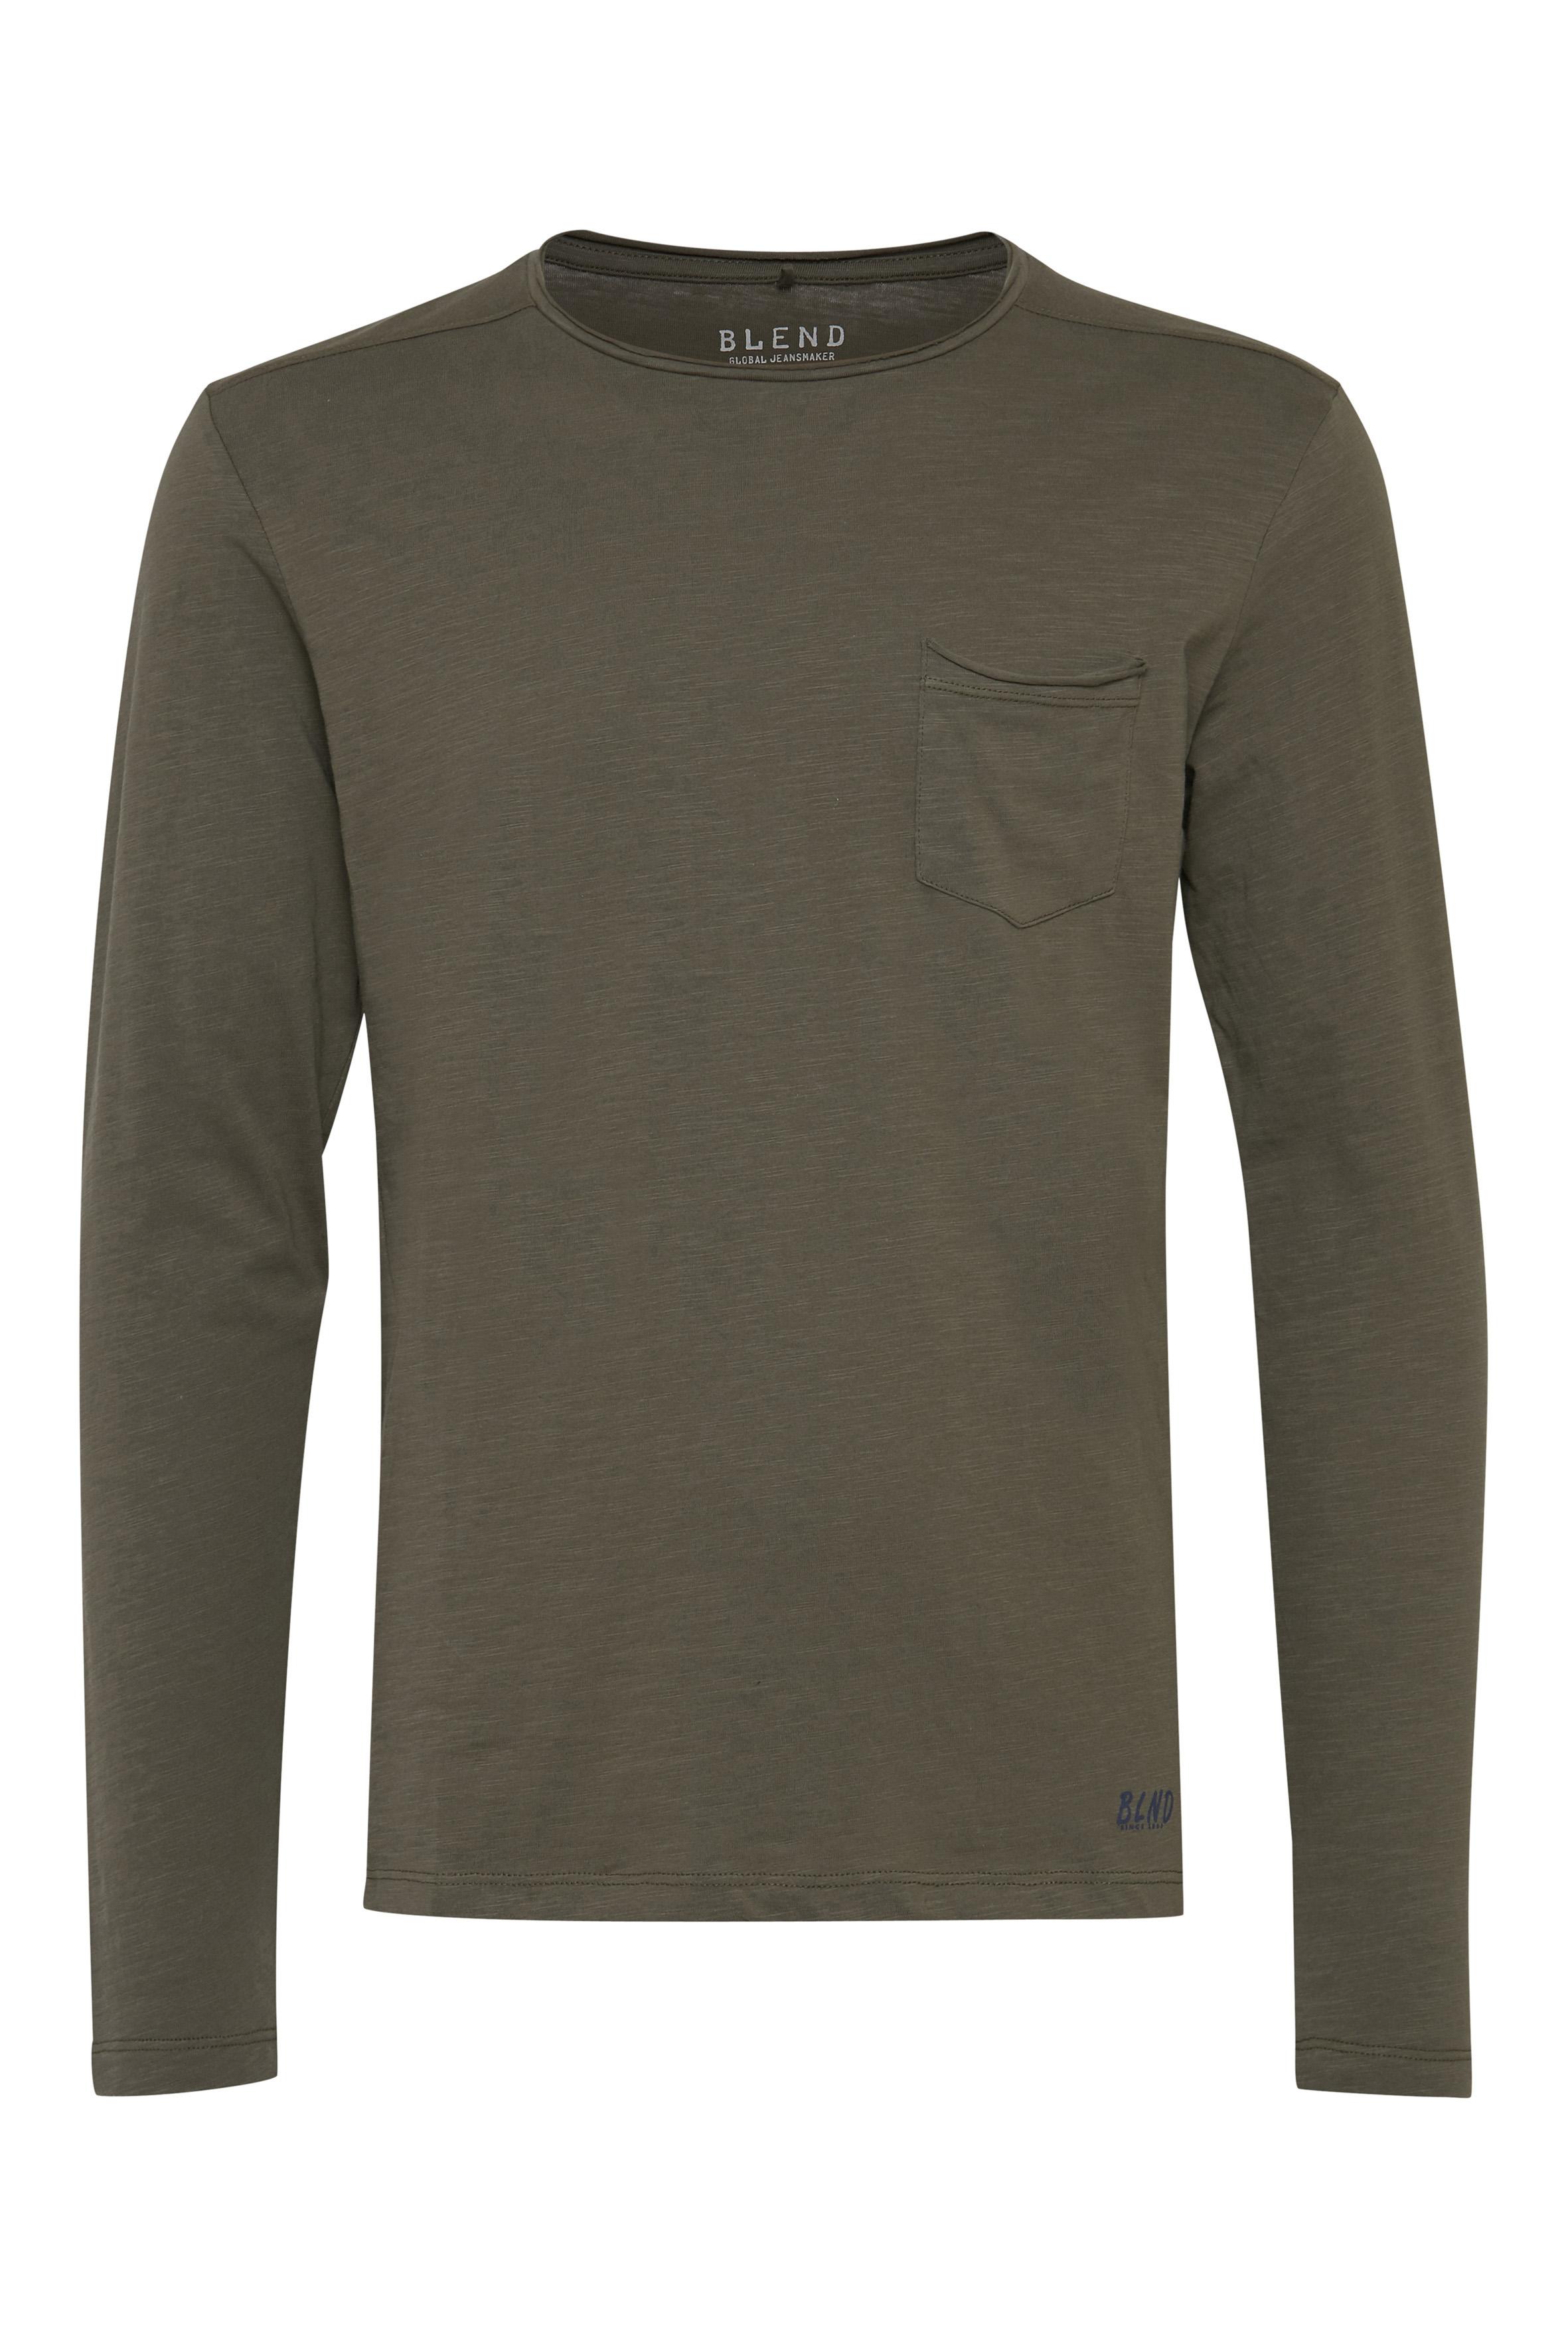 Dusty green BHNICOLAI Langærmet T-shirt – Køb Dusty green BHNICOLAI Langærmet T-shirt fra str. S-3XL her